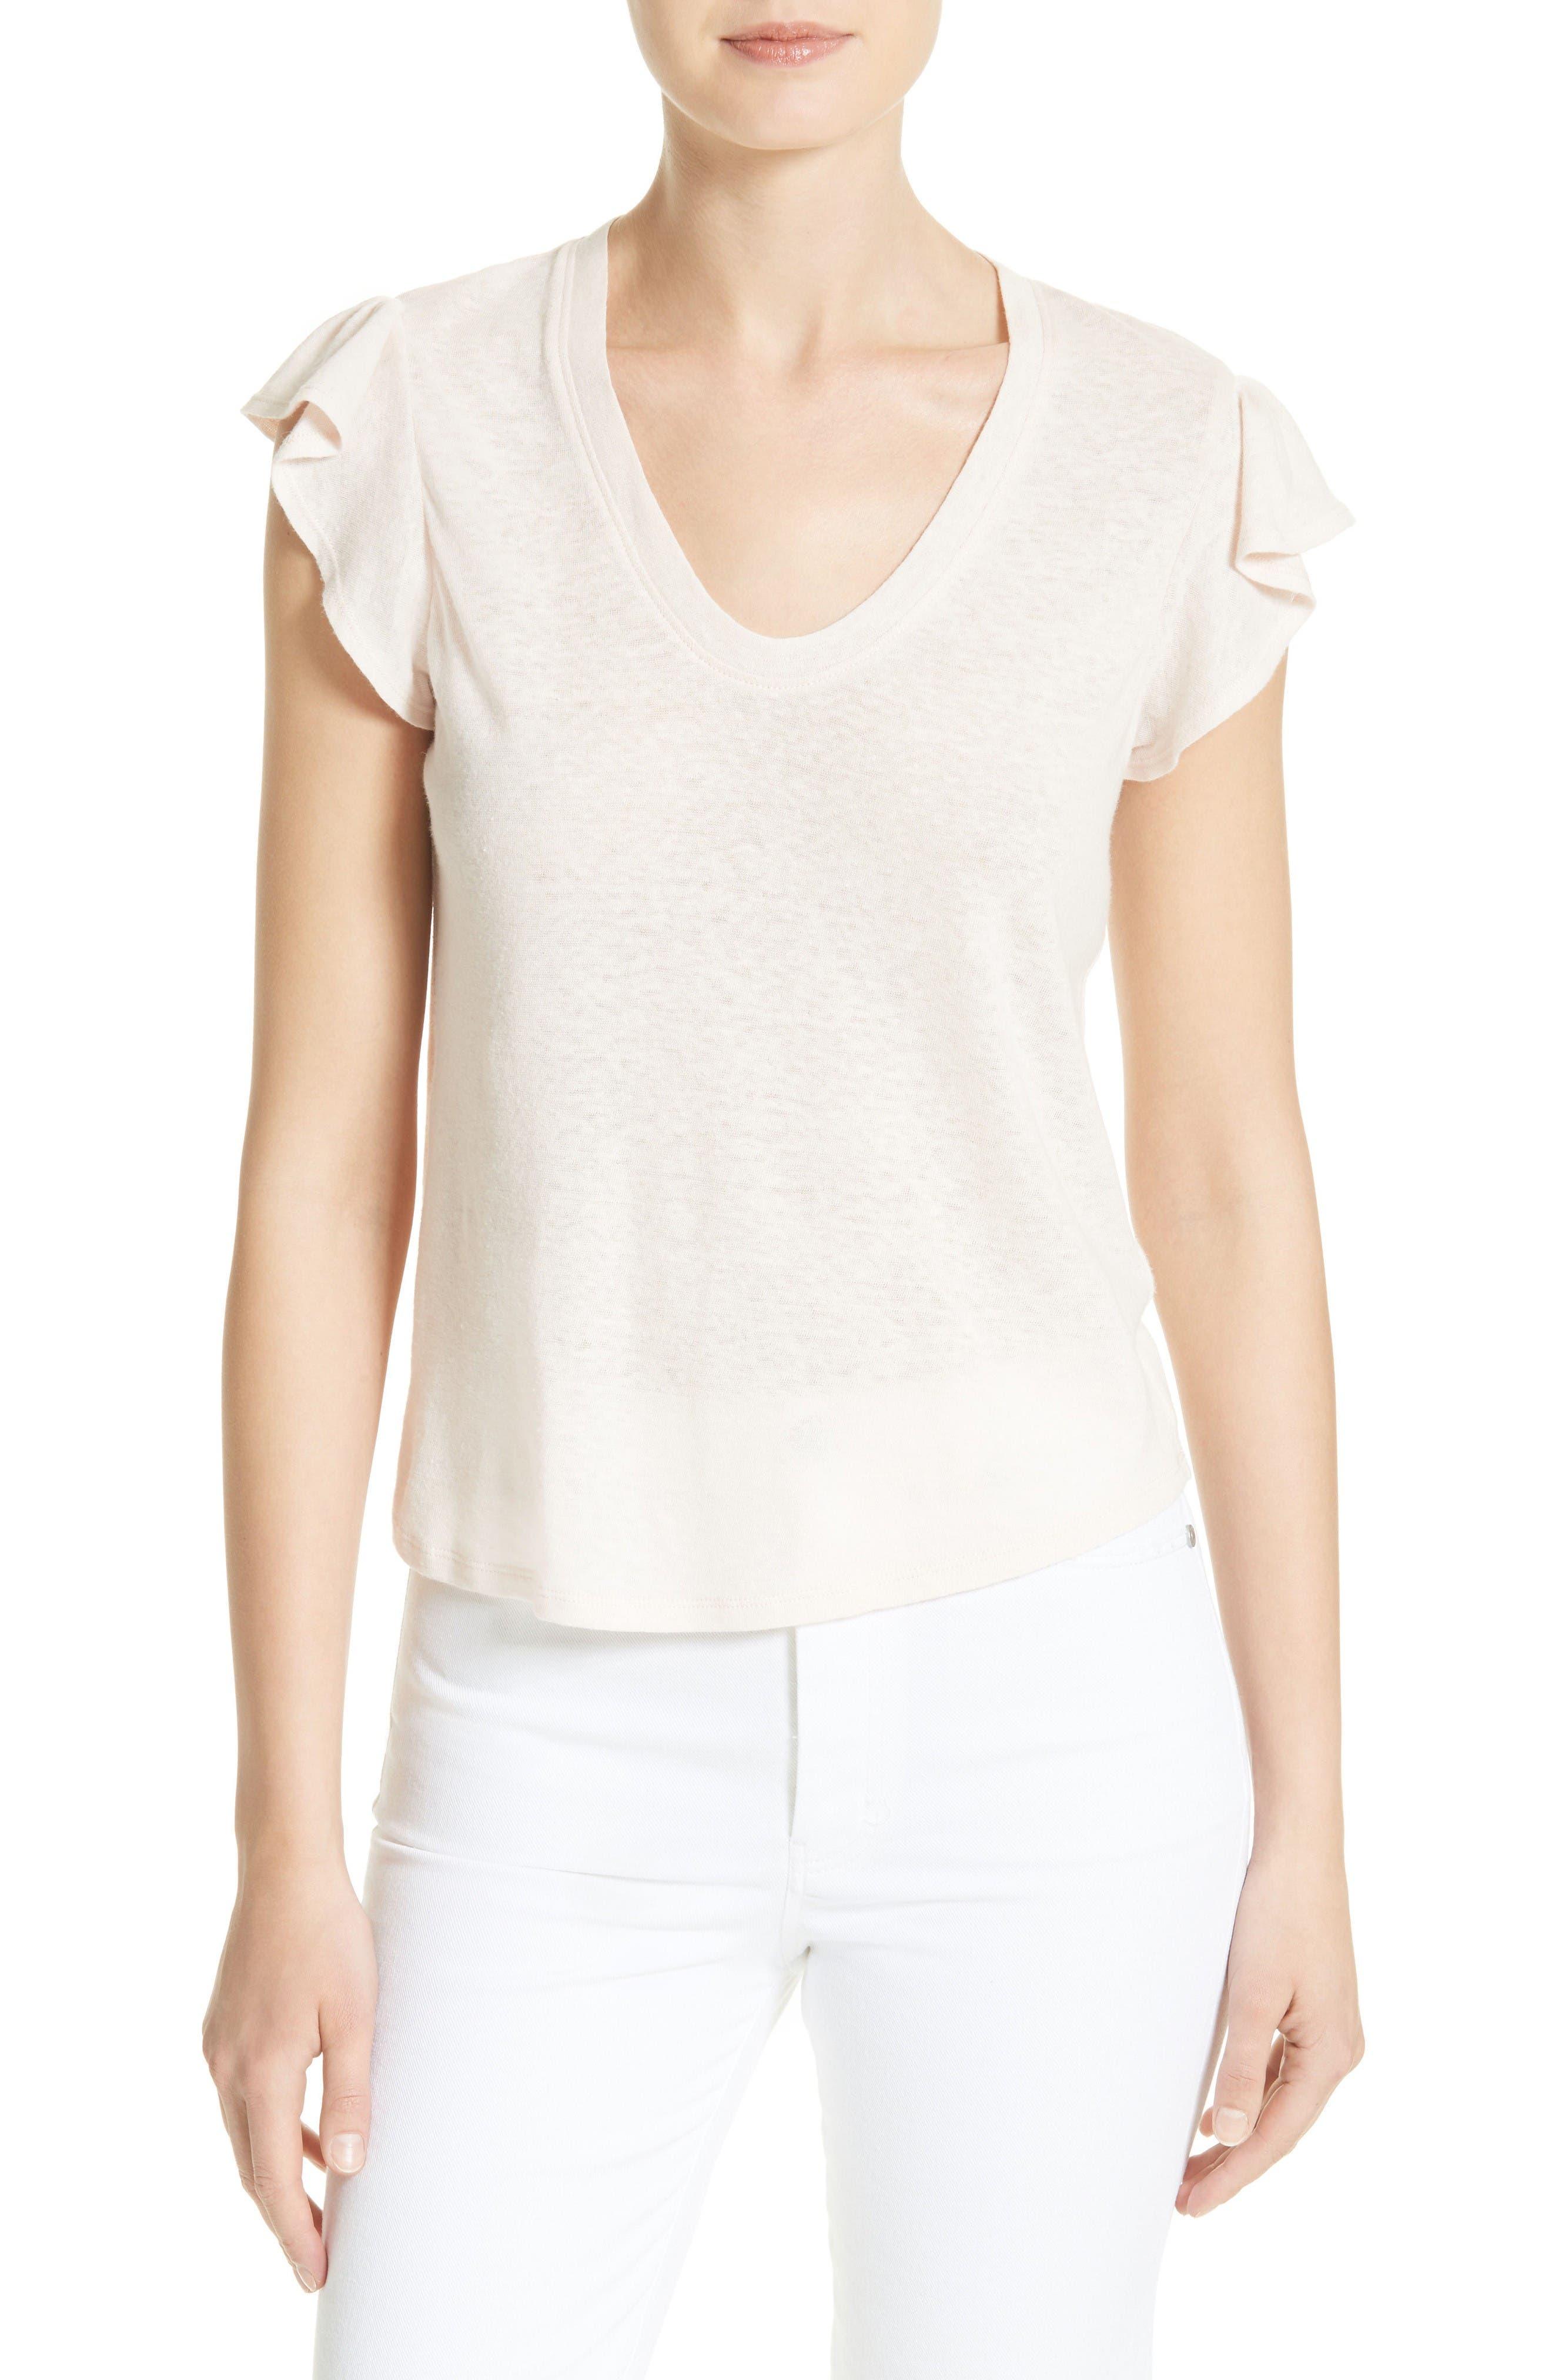 La Vie Rebecca Taylor Washed Linen & Cotton Jersey Top